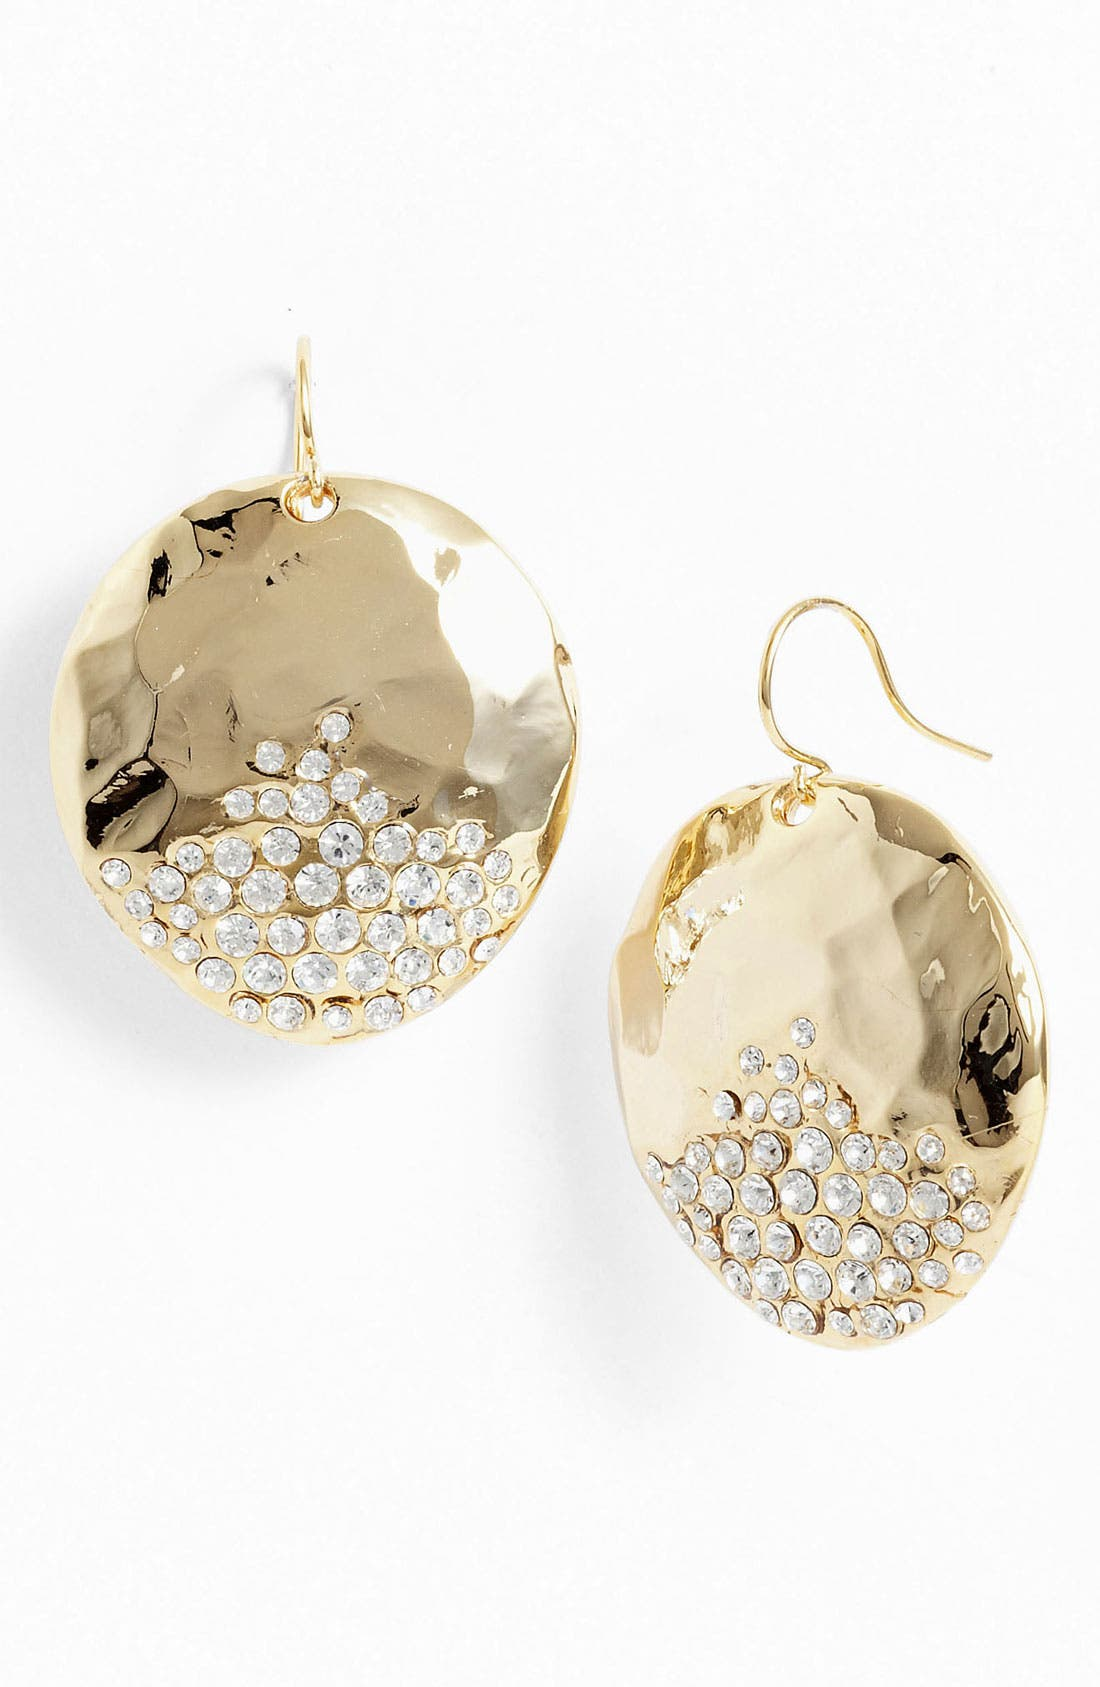 Alternate Image 1 Selected - Nordstrom 'Sand Dollar' Drop Earrings